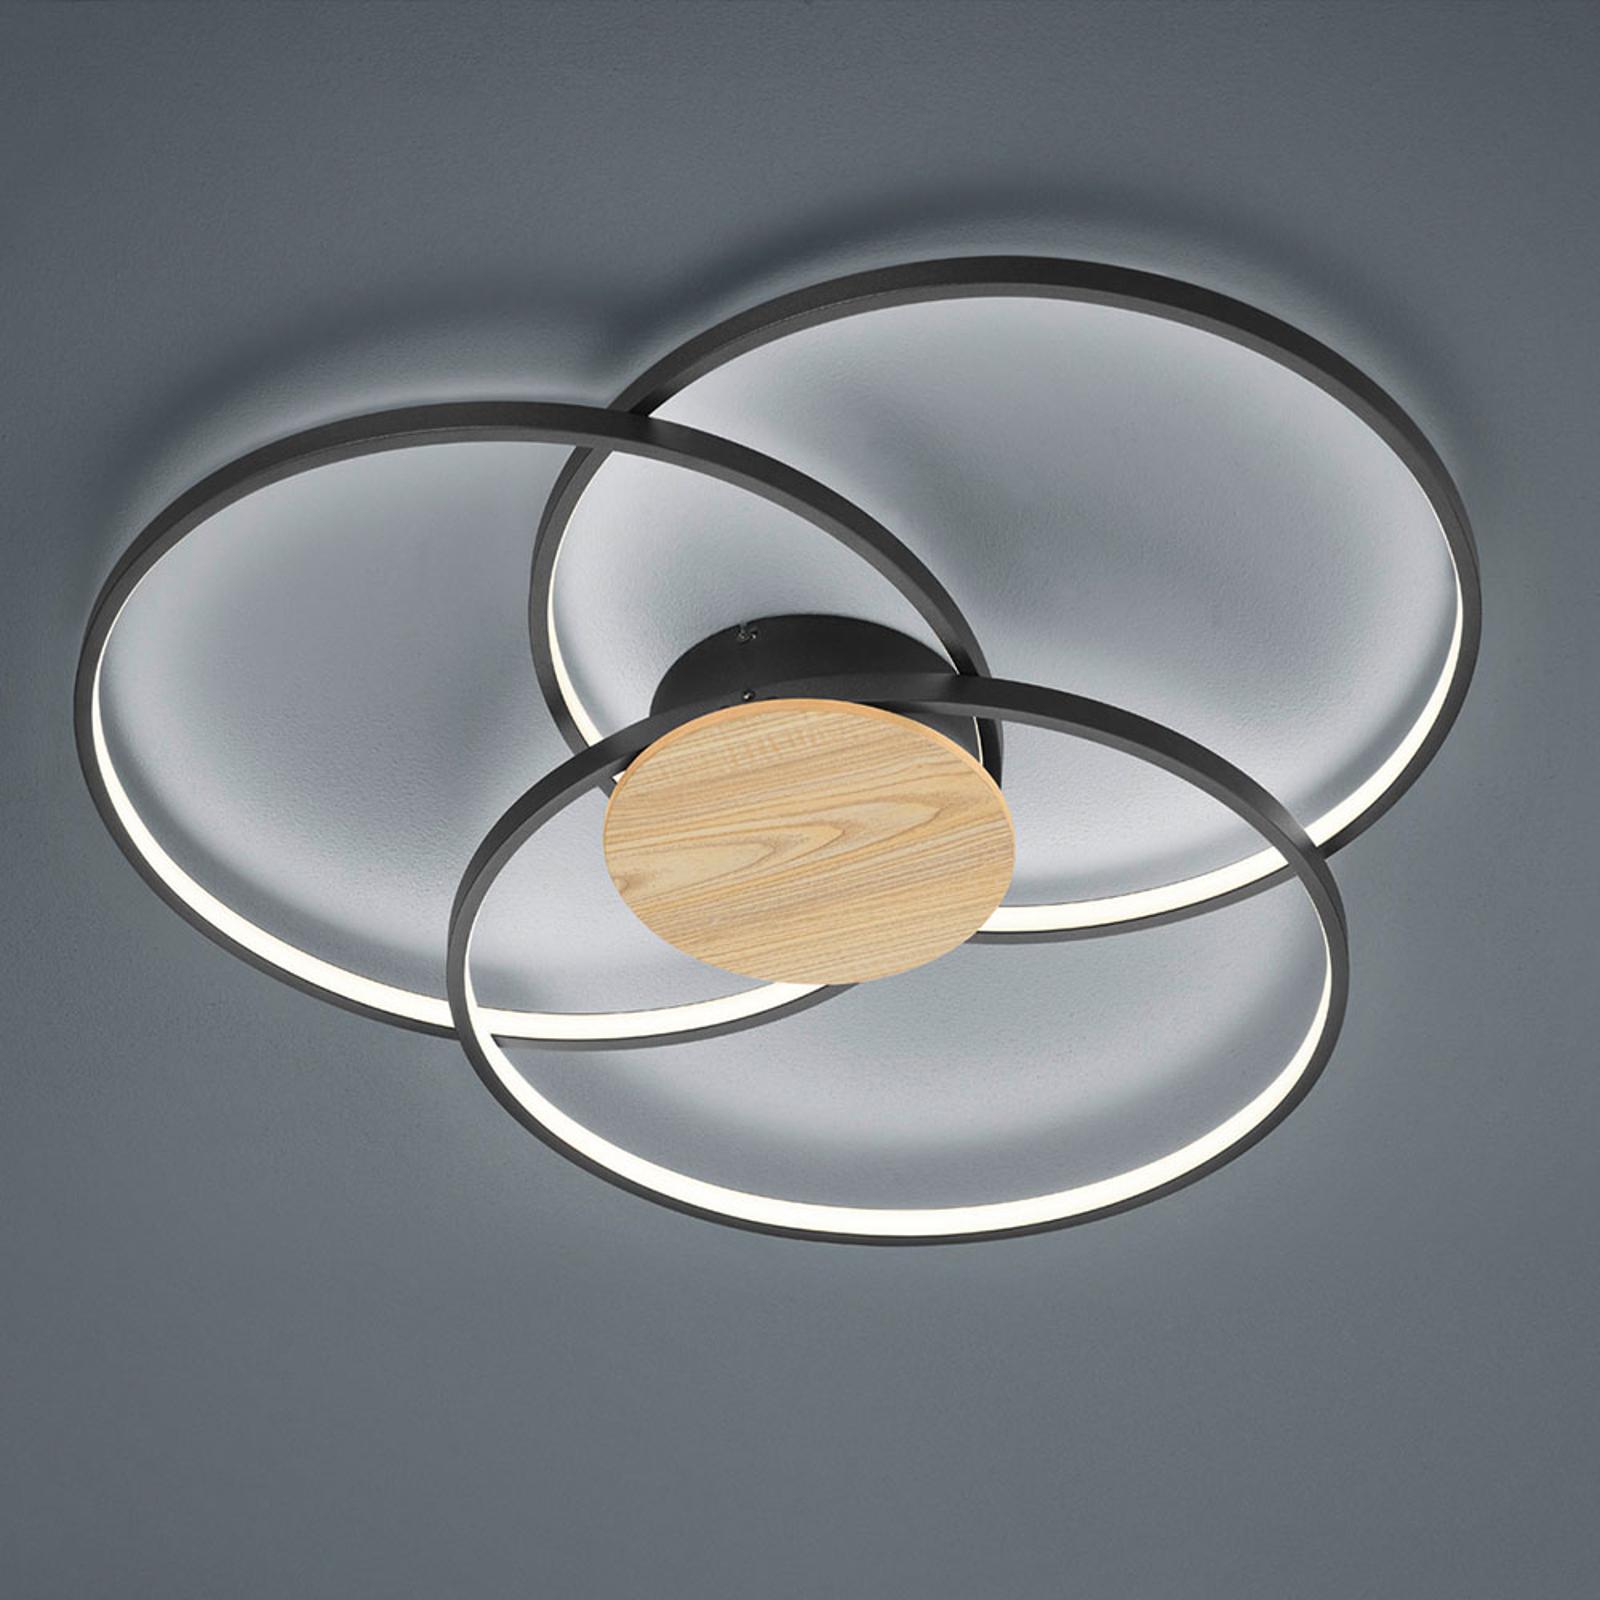 LED-taklampe Sedona med tredetaljer i matt svart